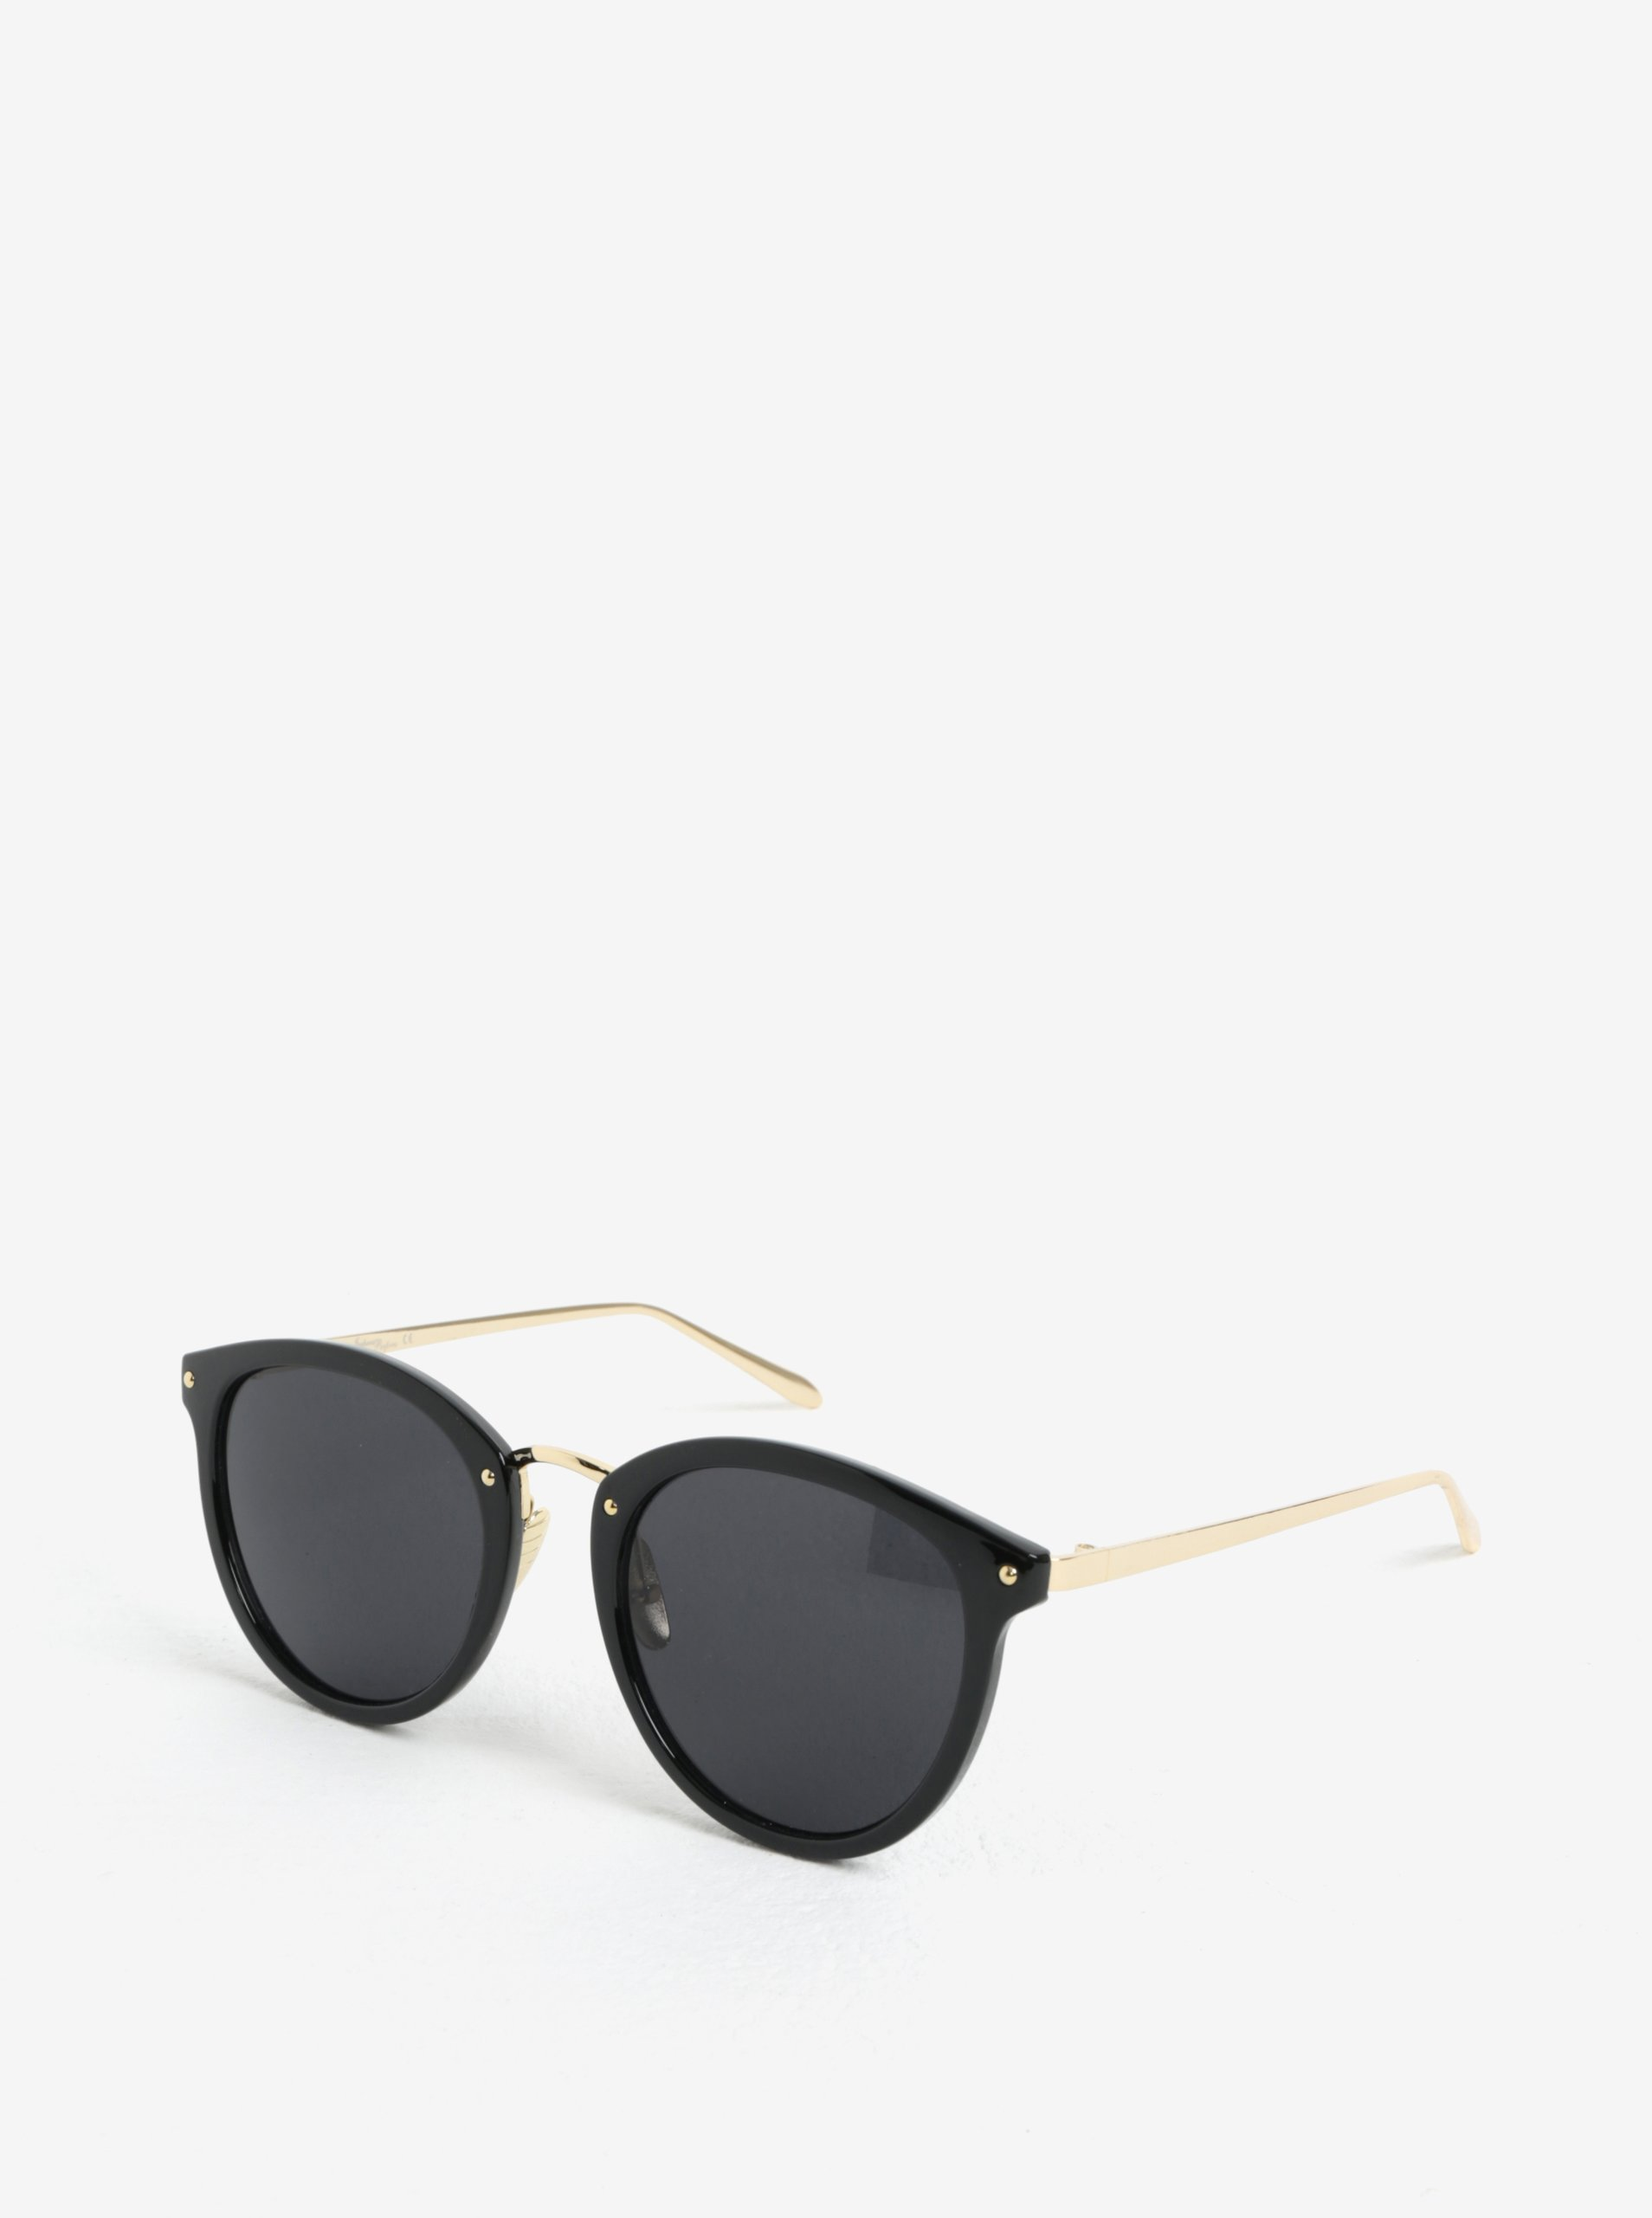 Čierne dámske slnečné okuliare Jeepers Peepers  e60c72f5509